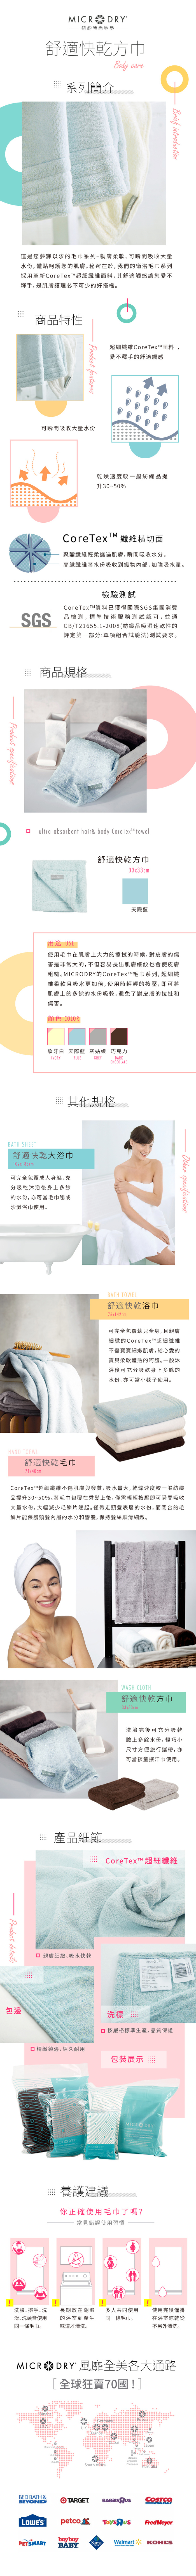 Microdry 舒適快乾方巾-天際藍